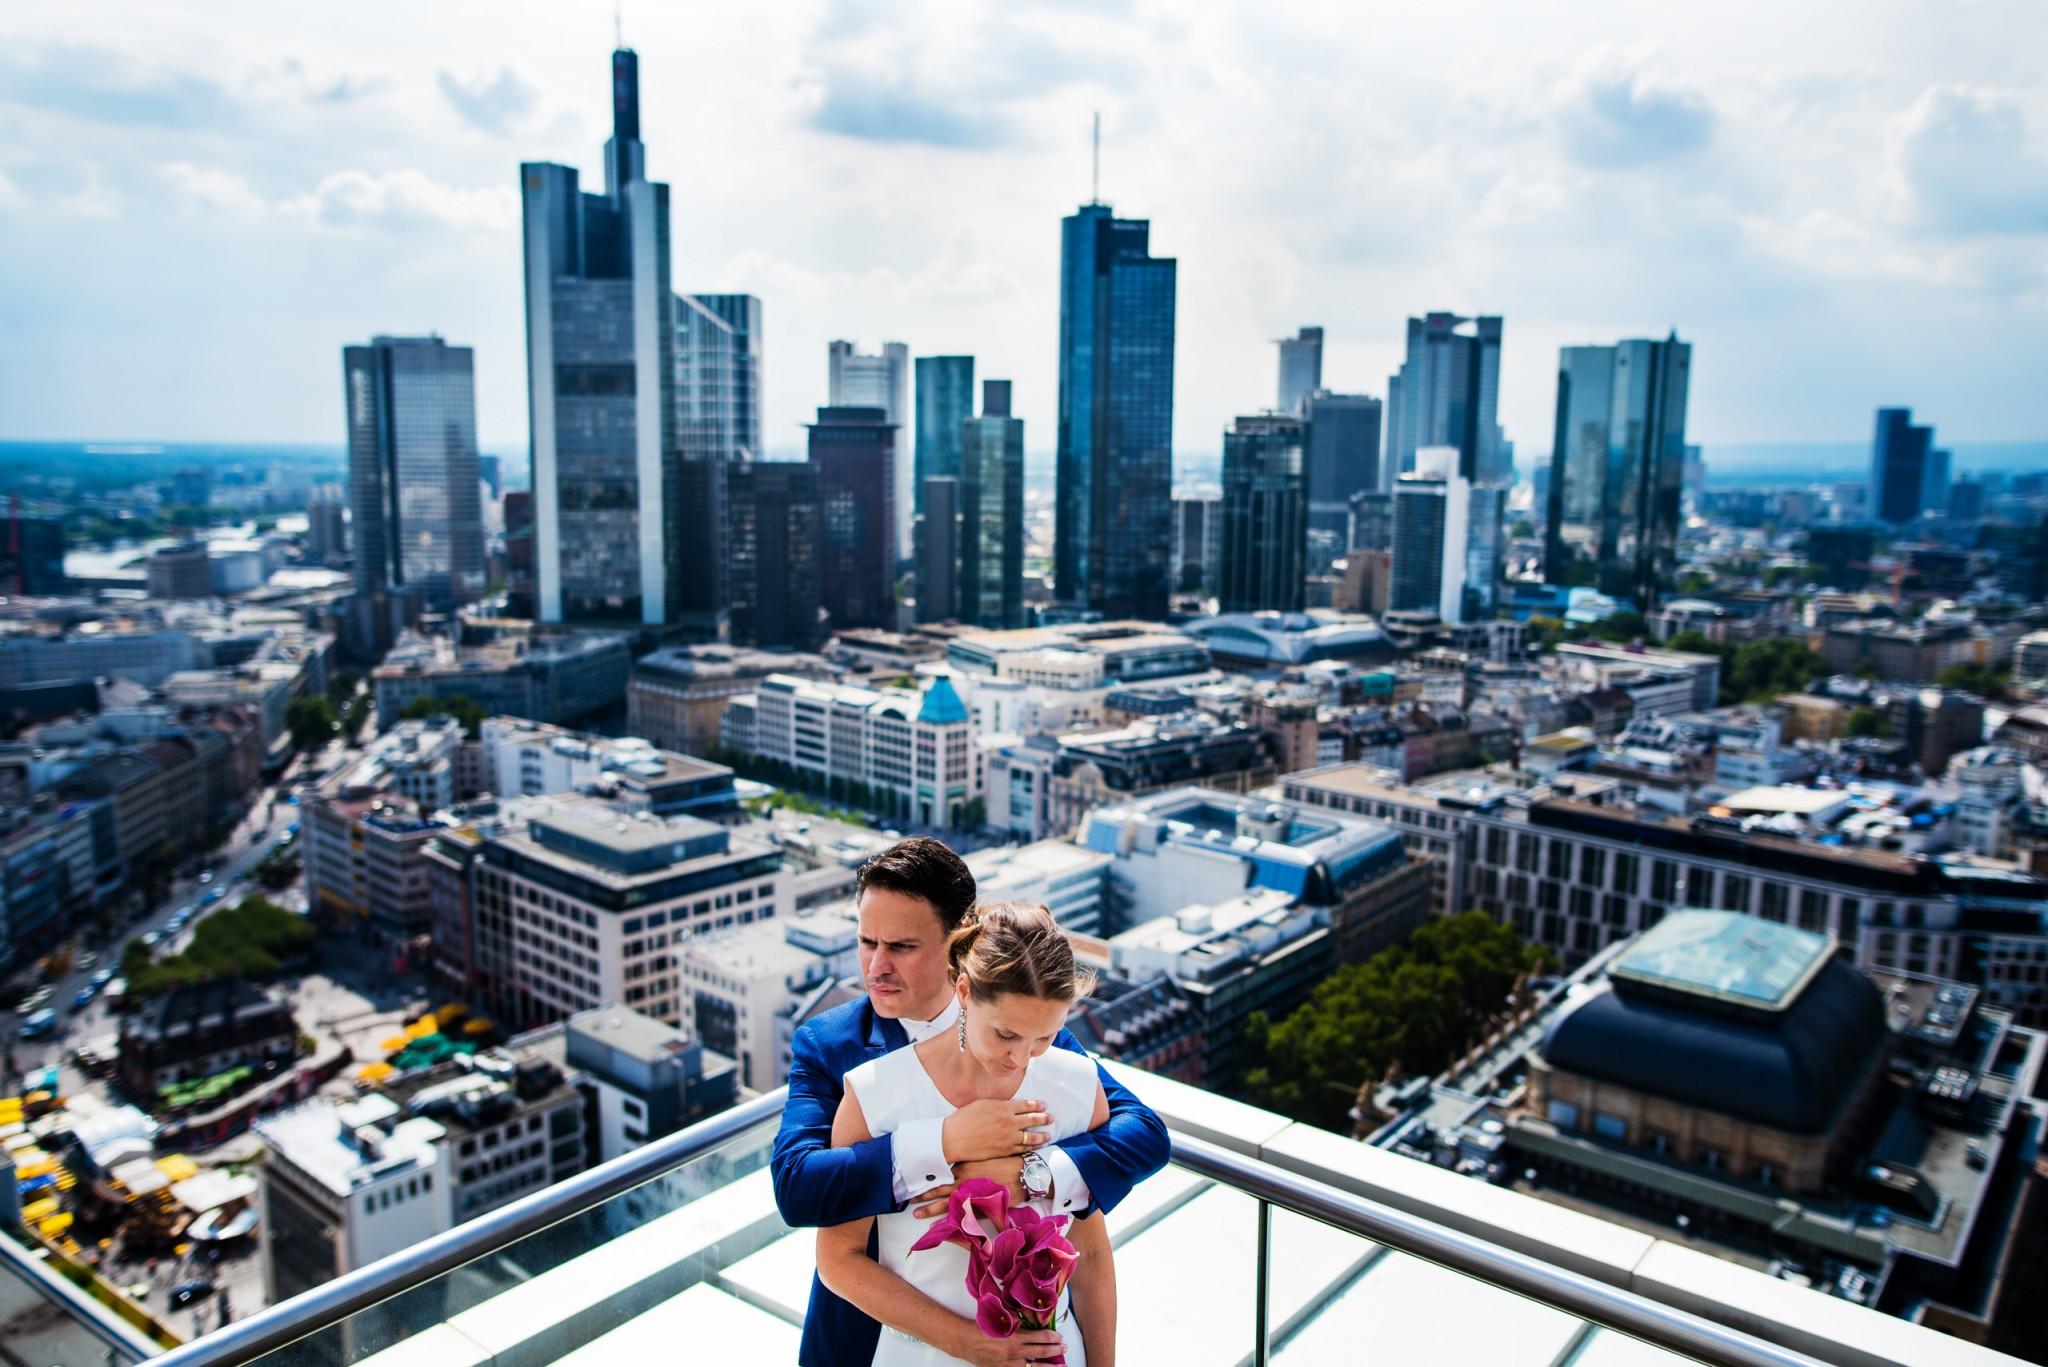 Hochzeitsfotograf-Frankfurt-160819-152407-2909-Art